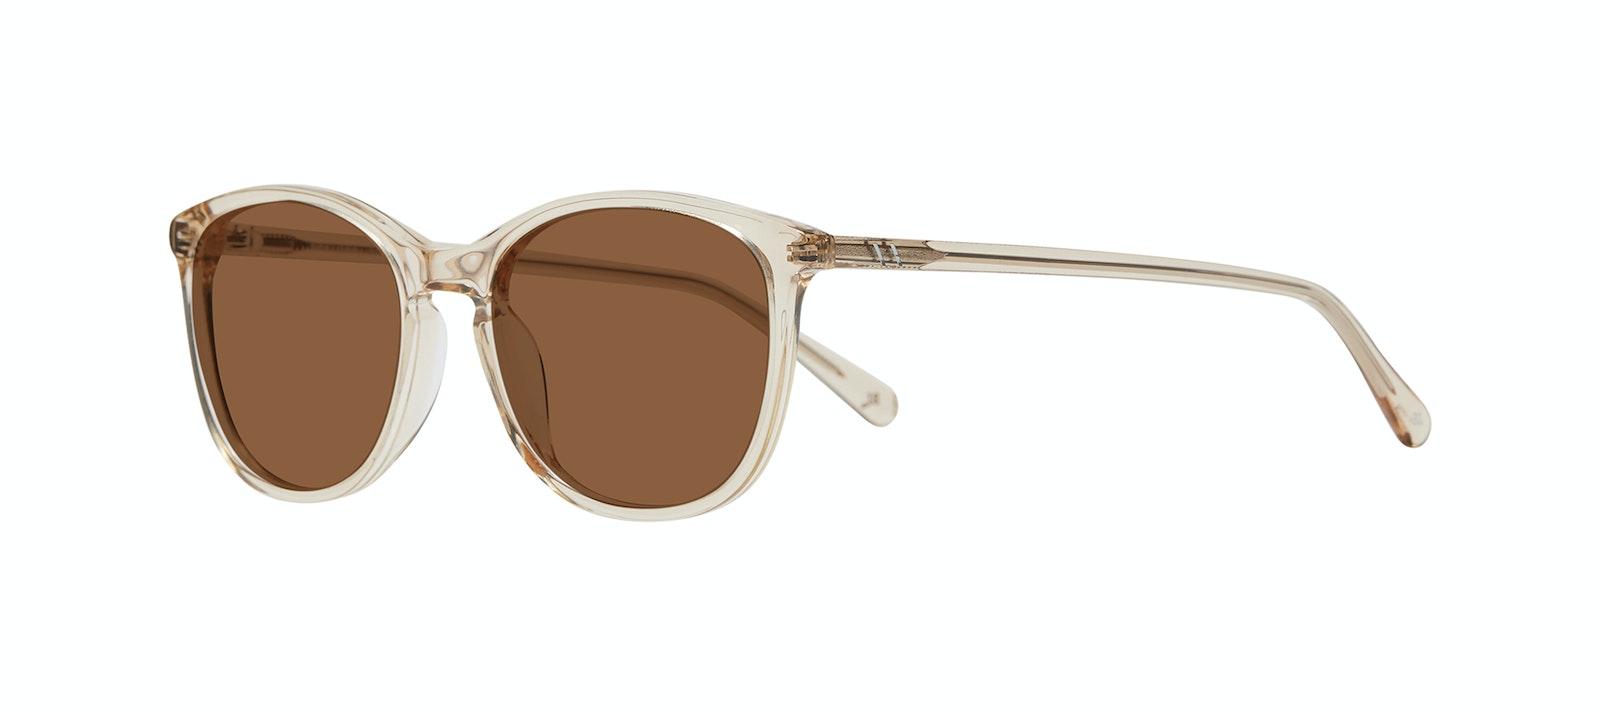 Affordable Fashion Glasses Rectangle Square Round Sunglasses Women Nadine XL Prosecco Tilt